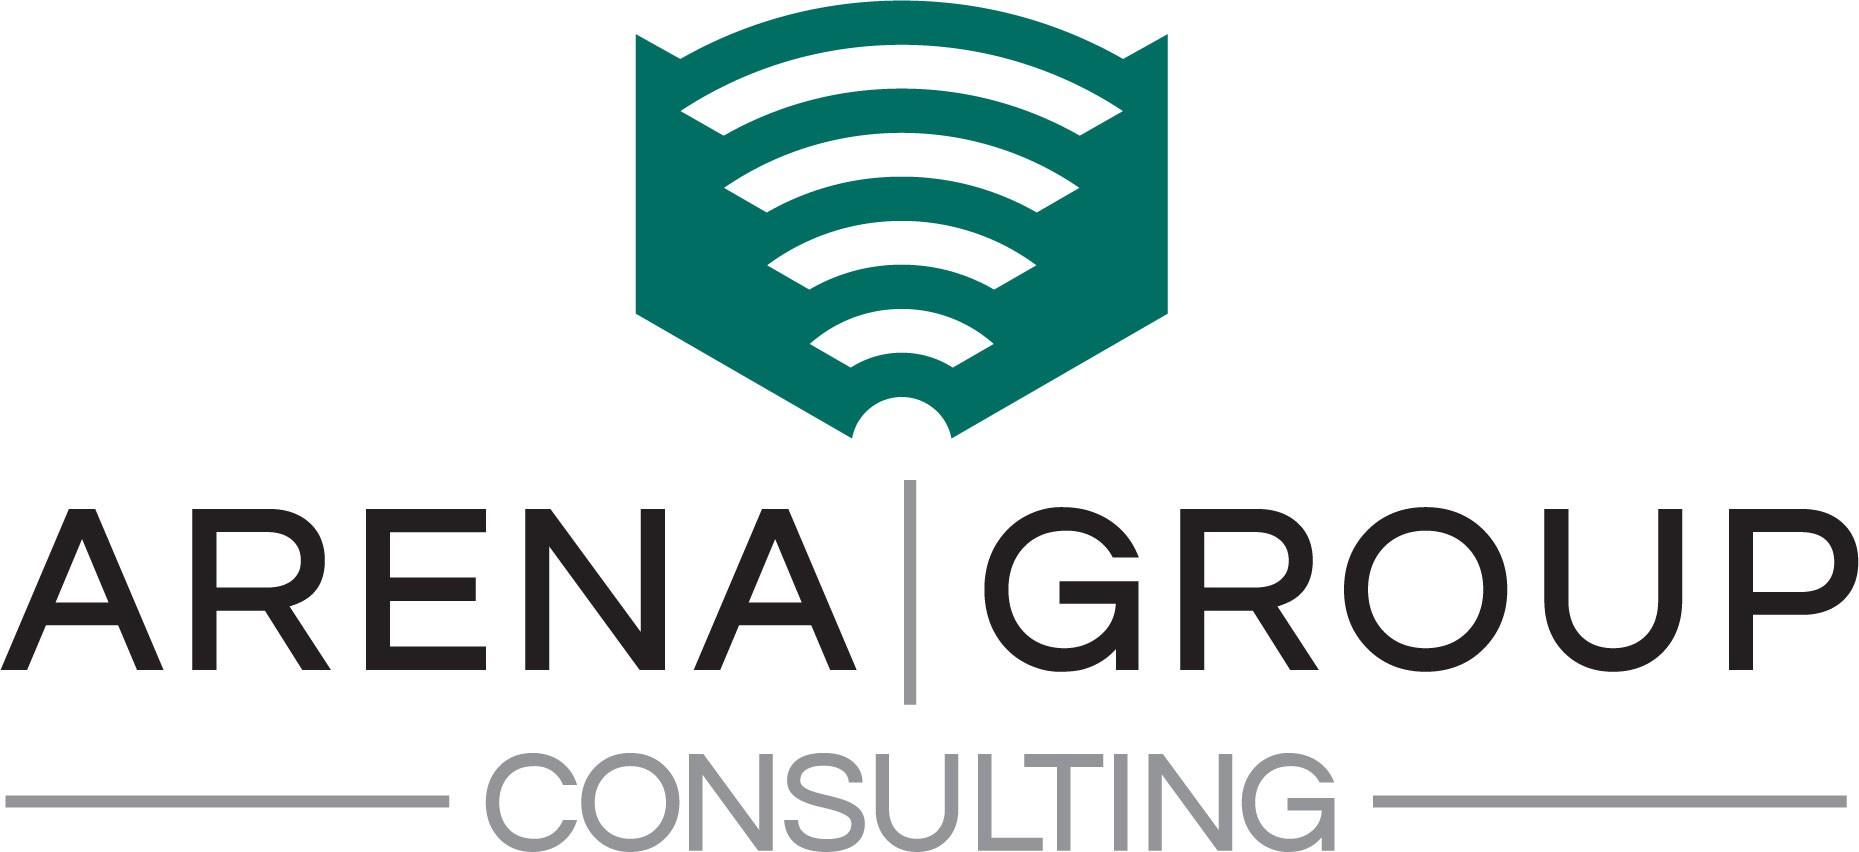 Design a professional logo for a local CBD consulting company